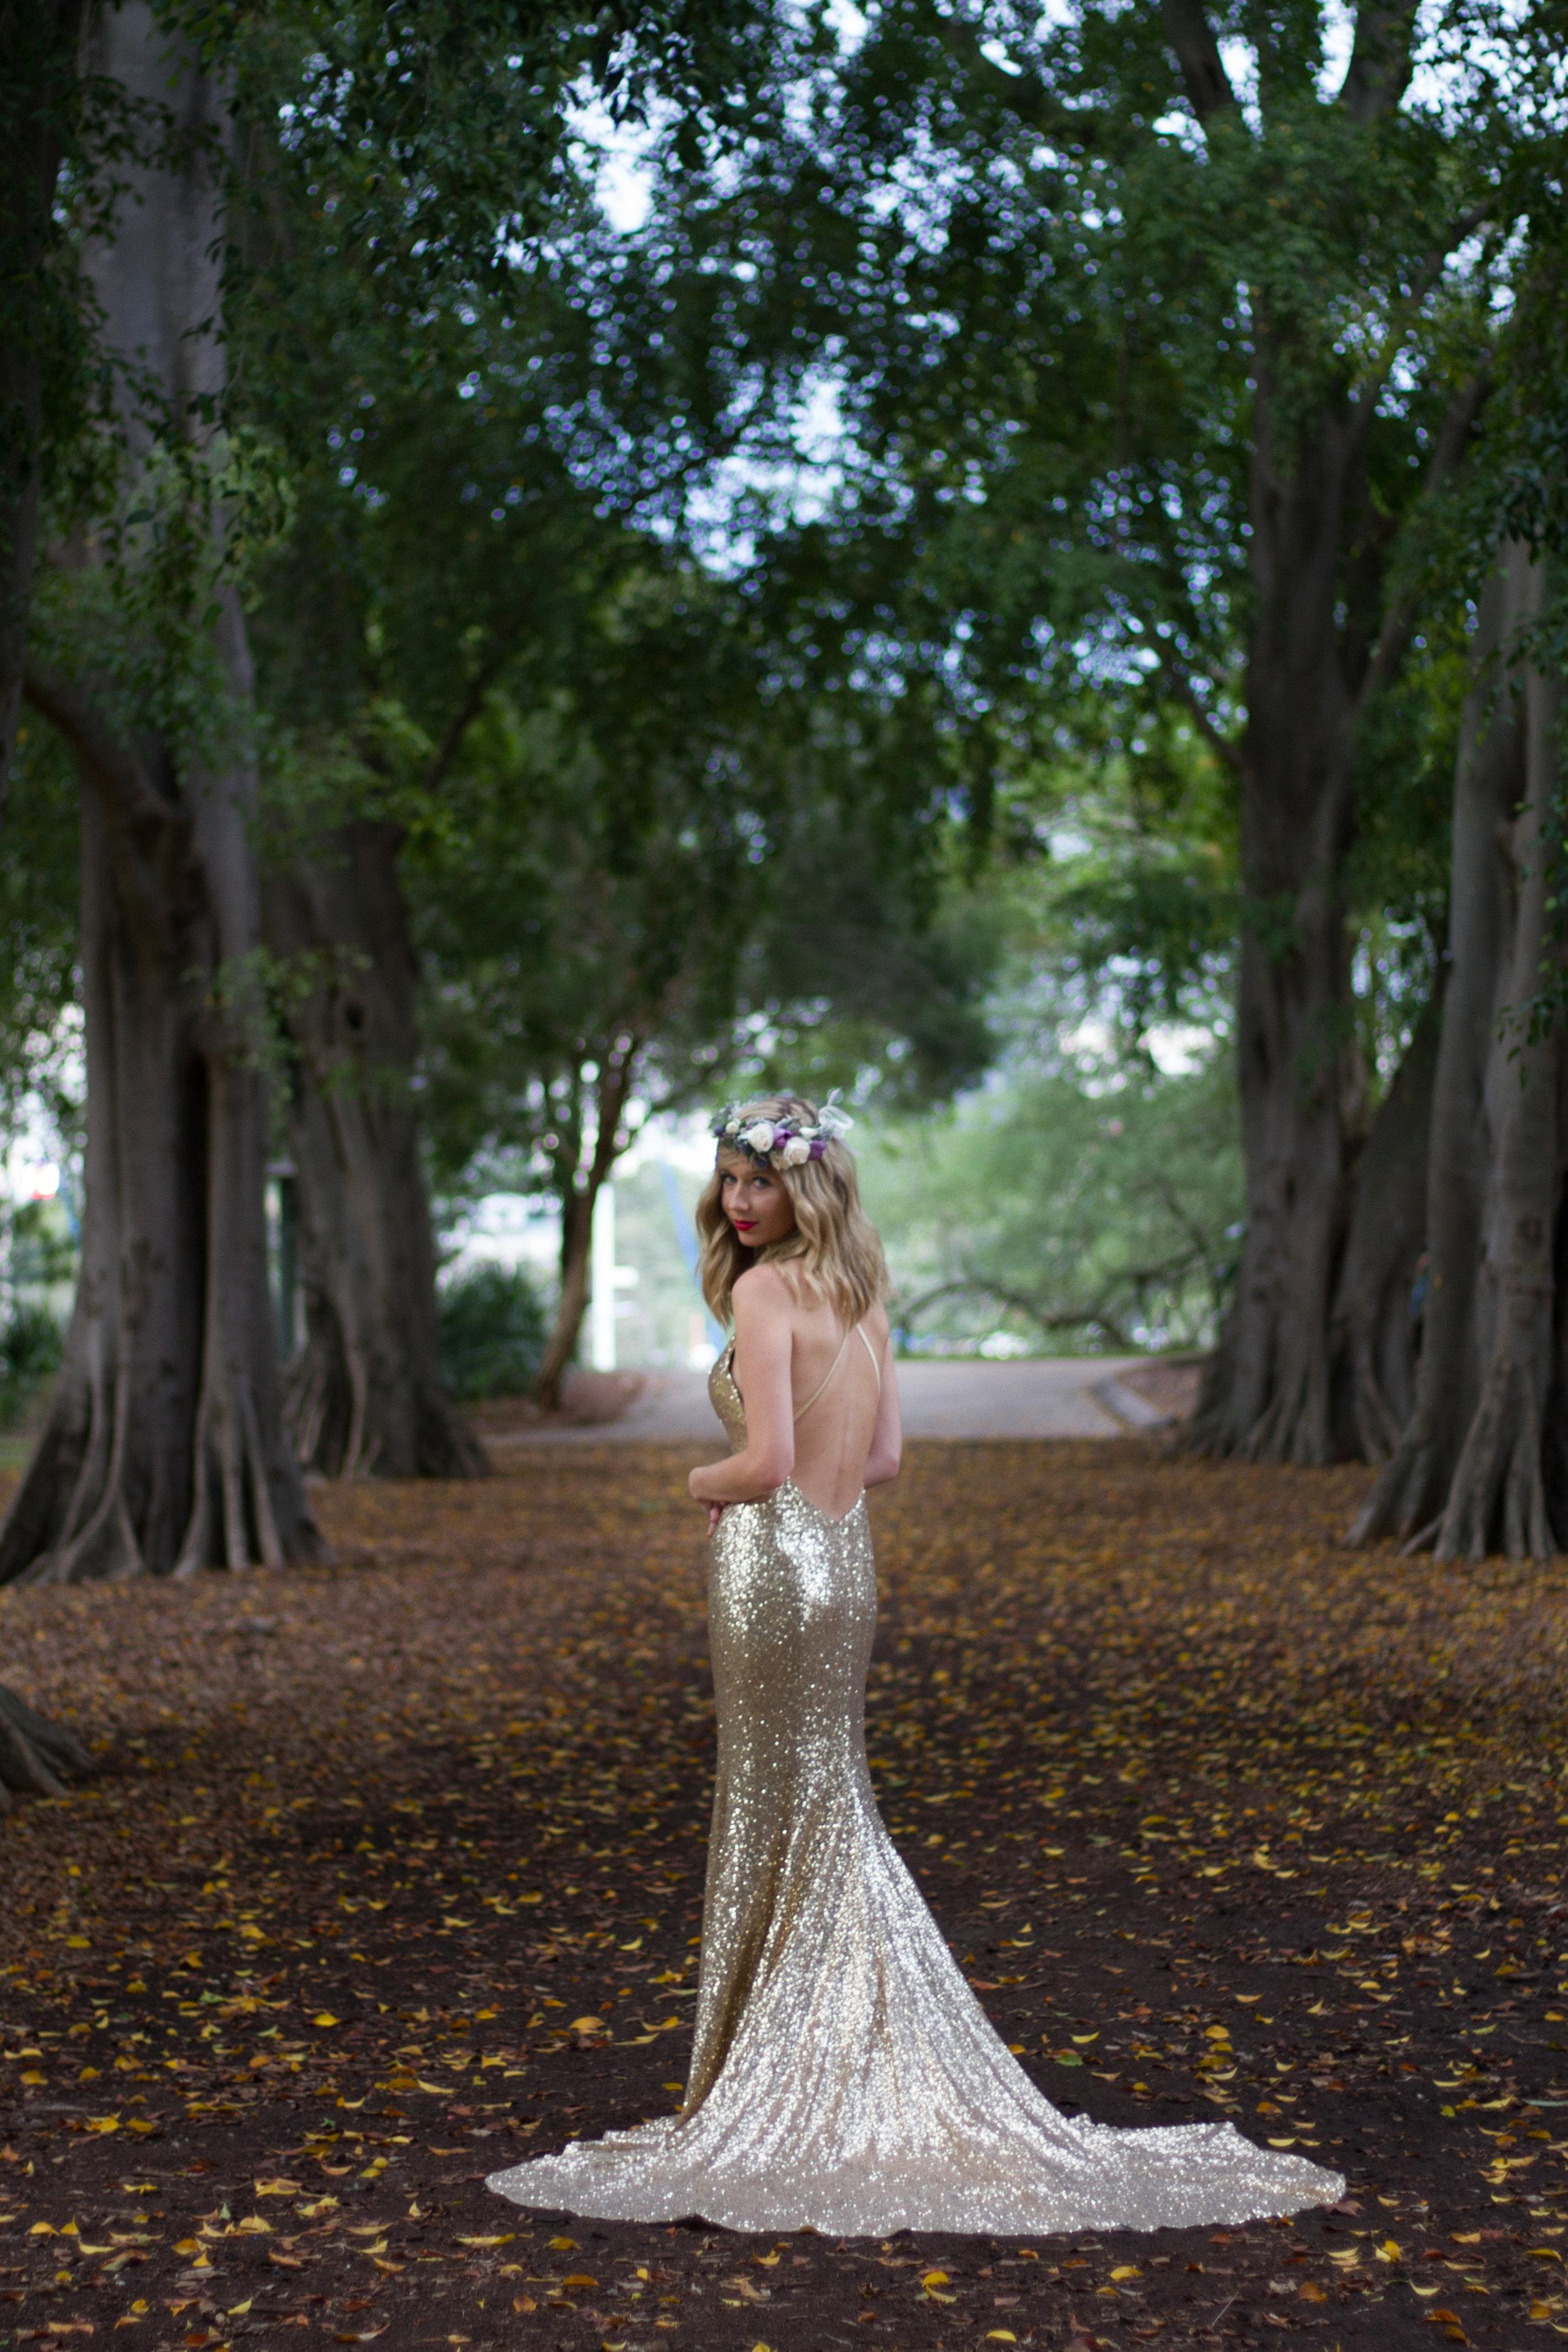 Bride Gold Metallic Wedding Dress Floral Crown Bohemian Chic Styling Brisbane Botanic Gardens Creative Photoshoot www.adella.photography